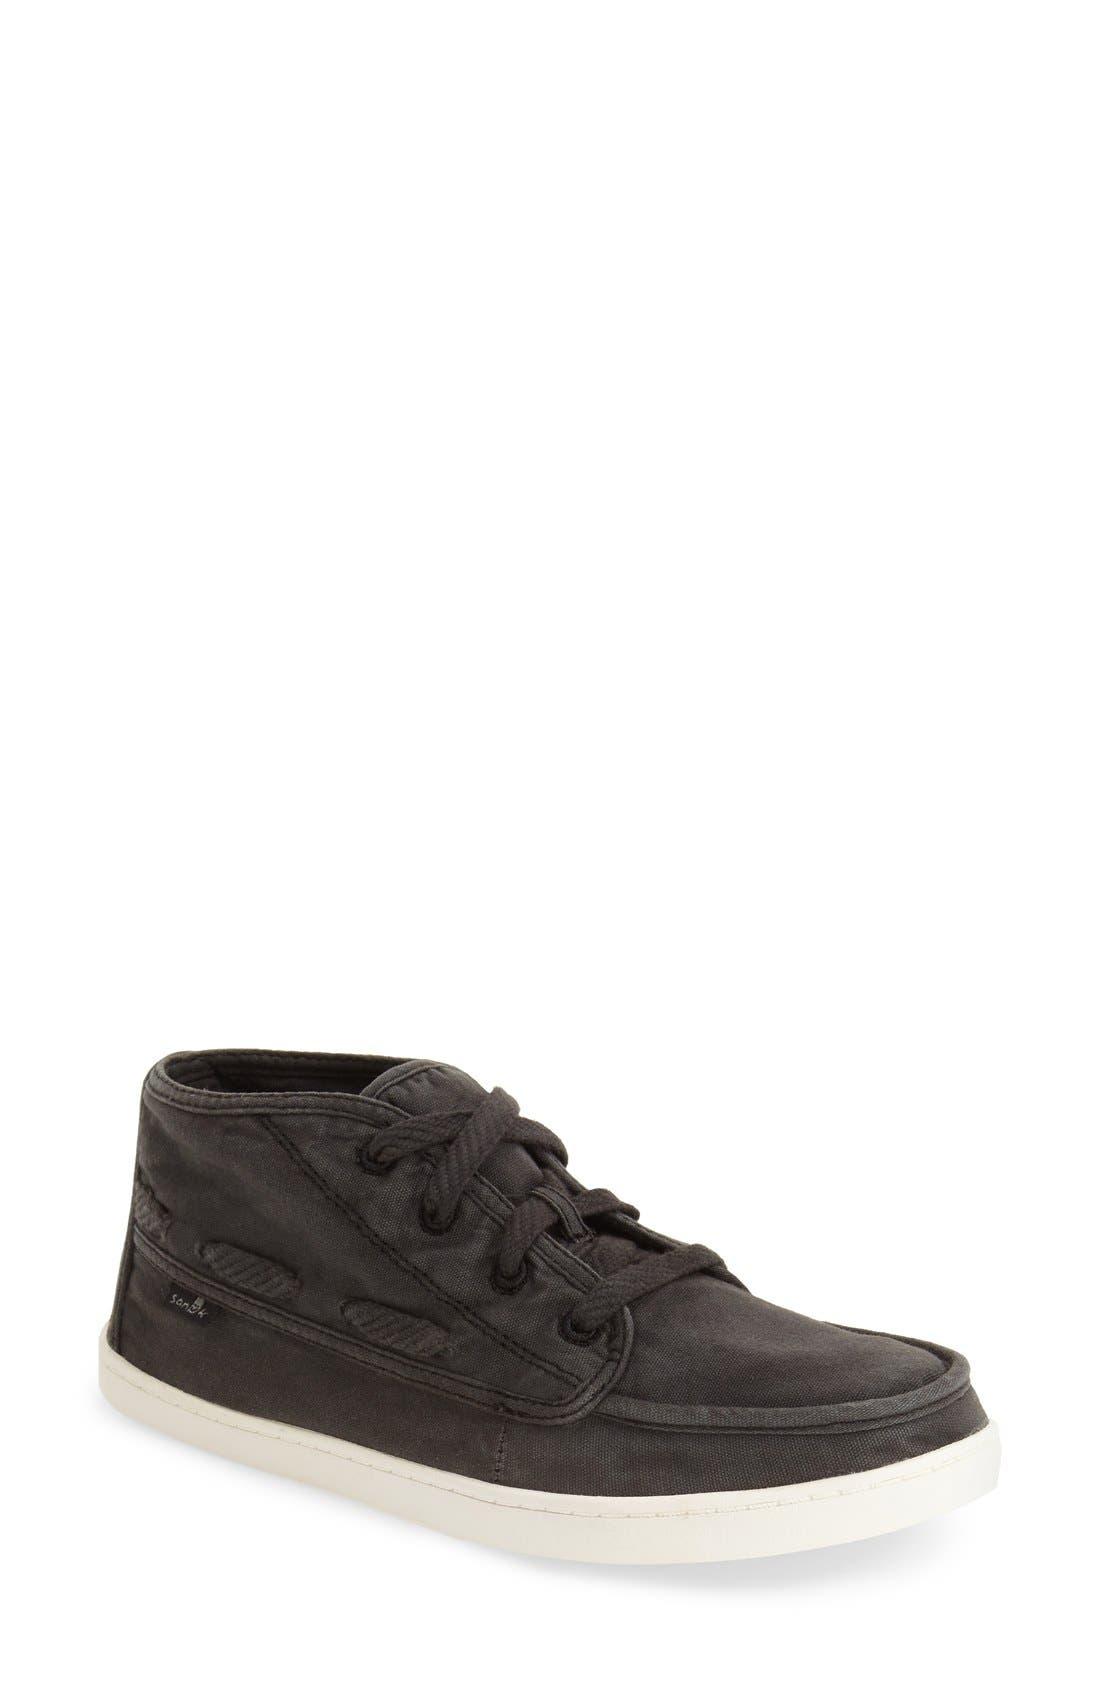 SANUK 'Vee K Shawn' High Top Sneaker